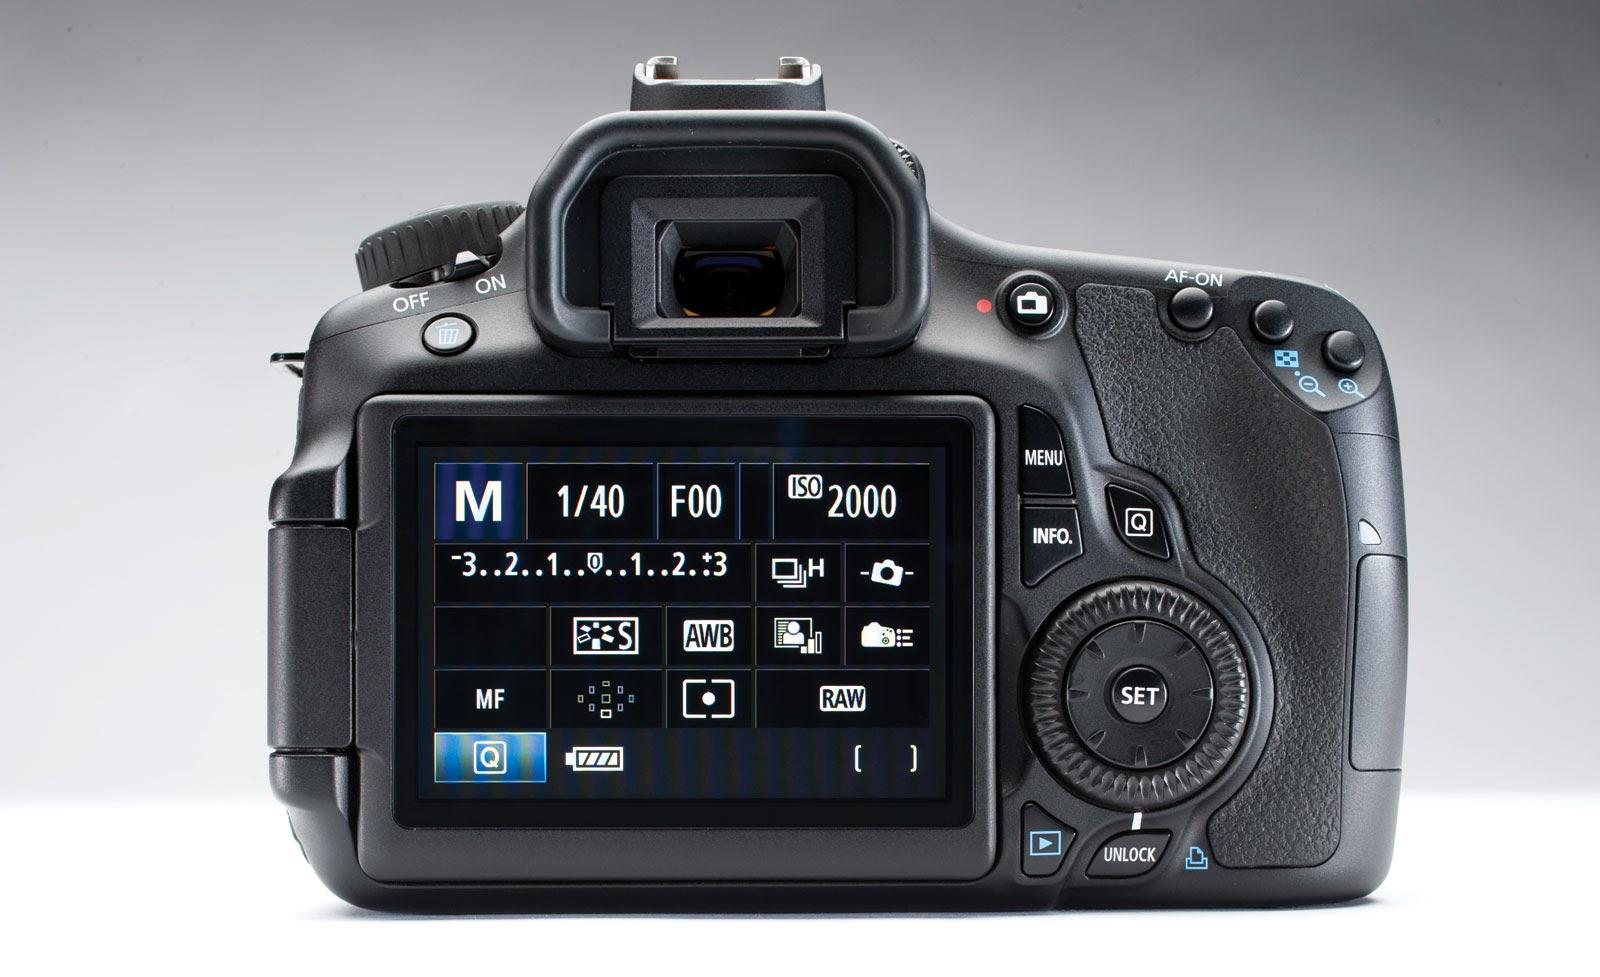 Foto Kamera Canon EOS 60D Tampilan LCD